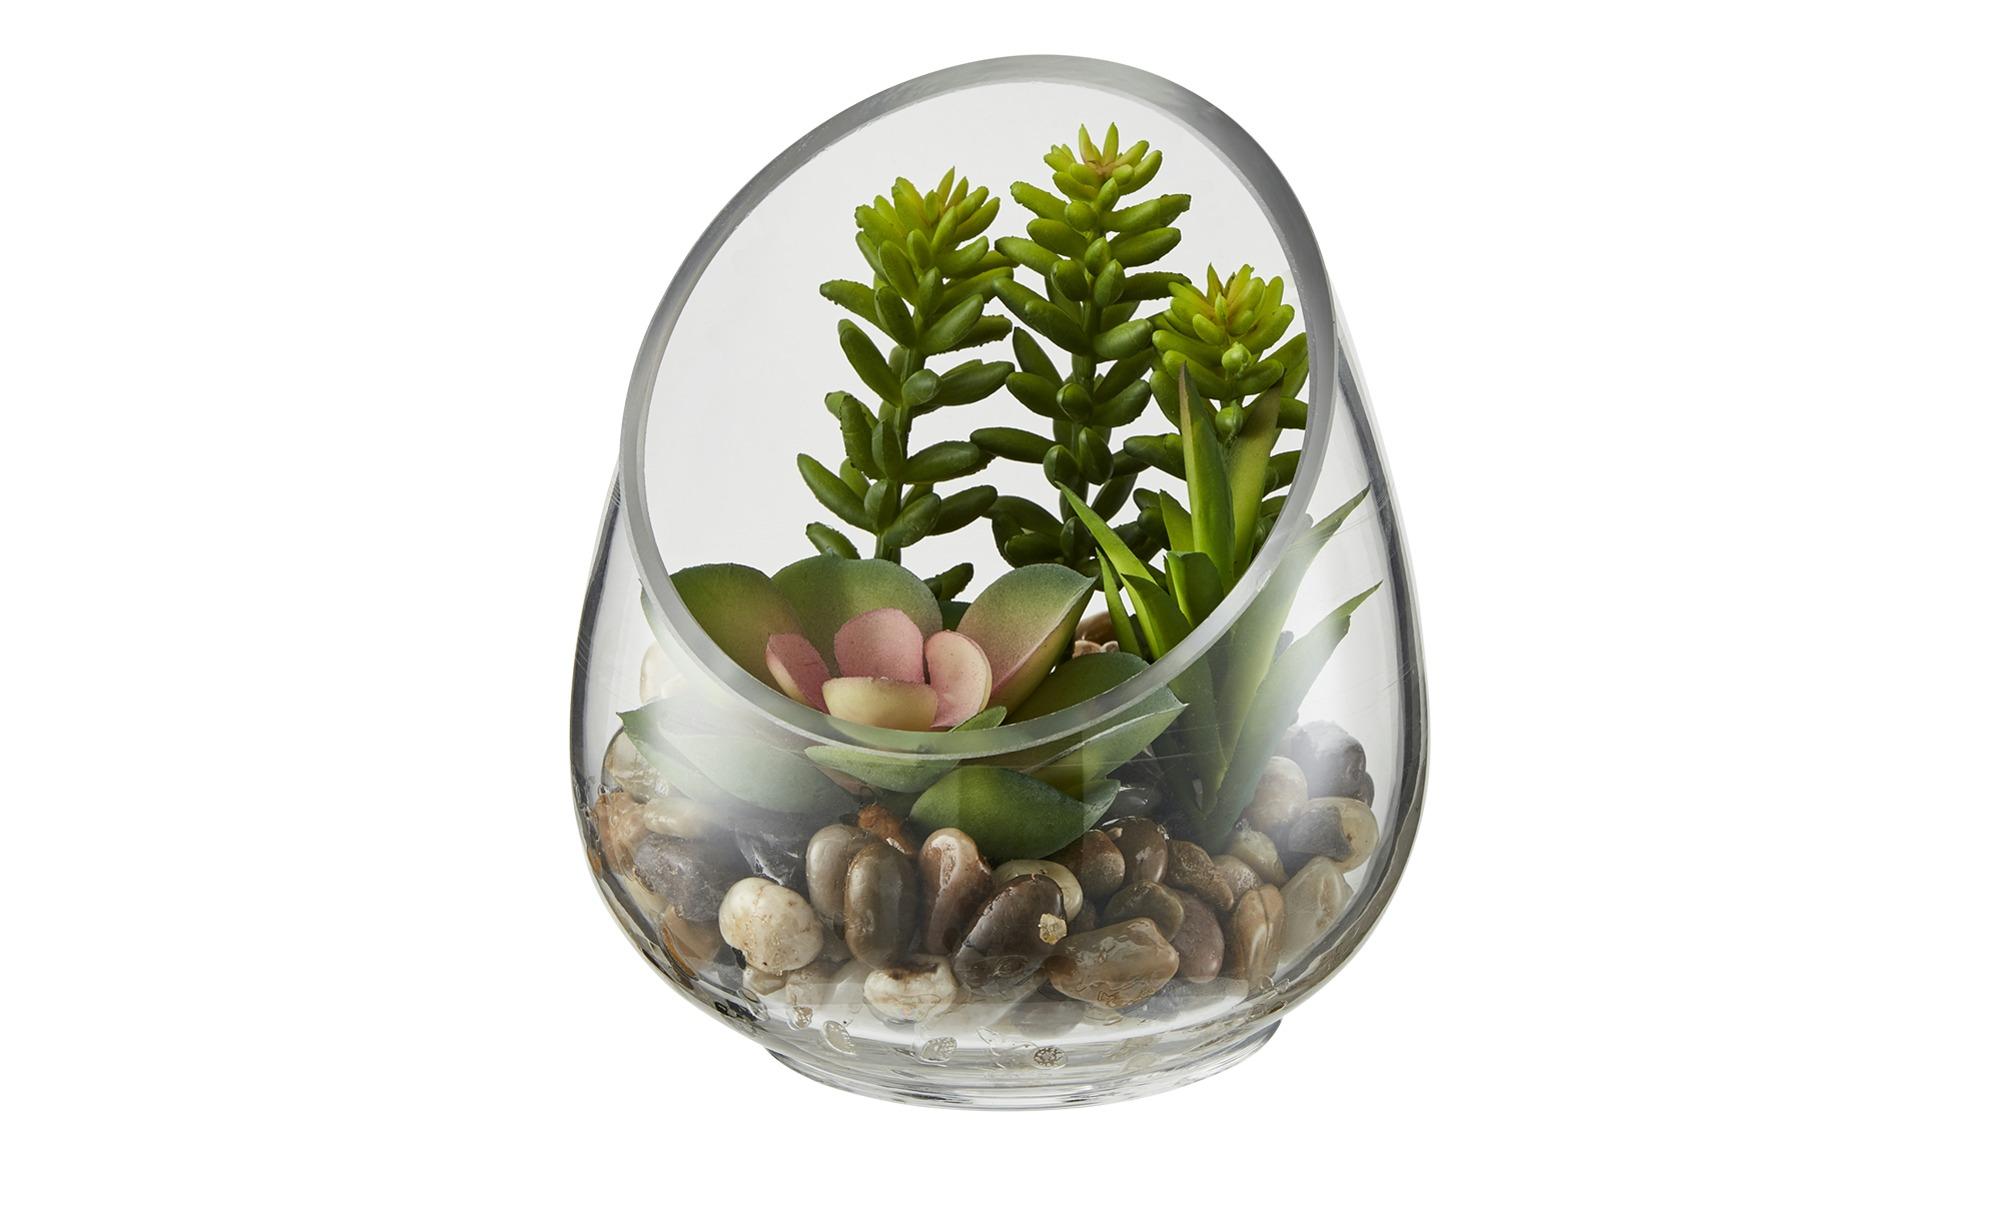 Sukkulente im Glas - grün - Glas , Naturprodukte, Kunststoff - 12 cm - Dekoration > Kunstblumen - Möbel Kraft   Dekoration > Dekopflanzen > Kunstpflanzen   Sconto